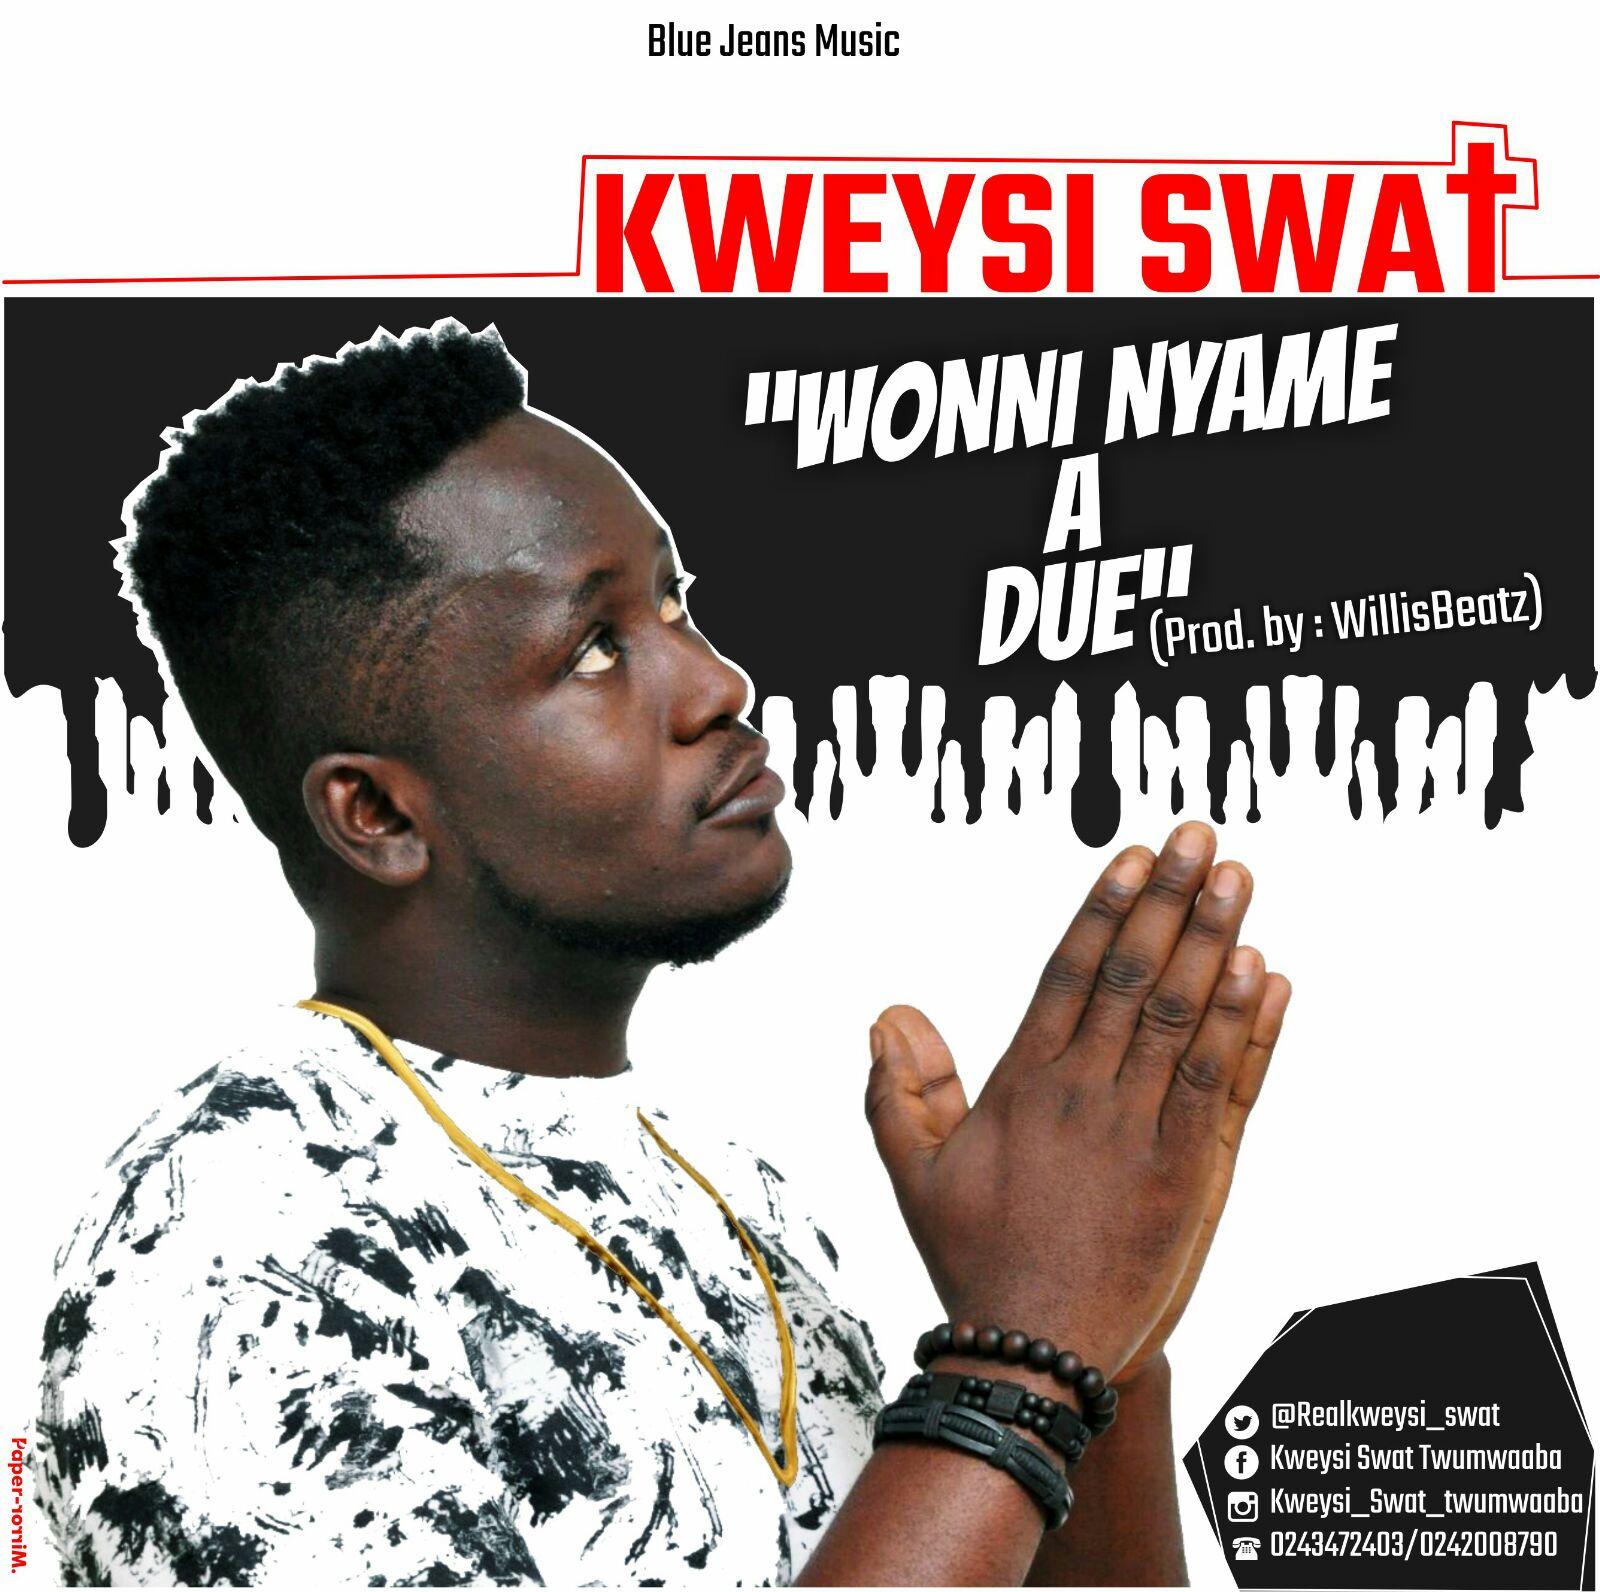 Kweysi Swat Wonni Nyame a Due Prod